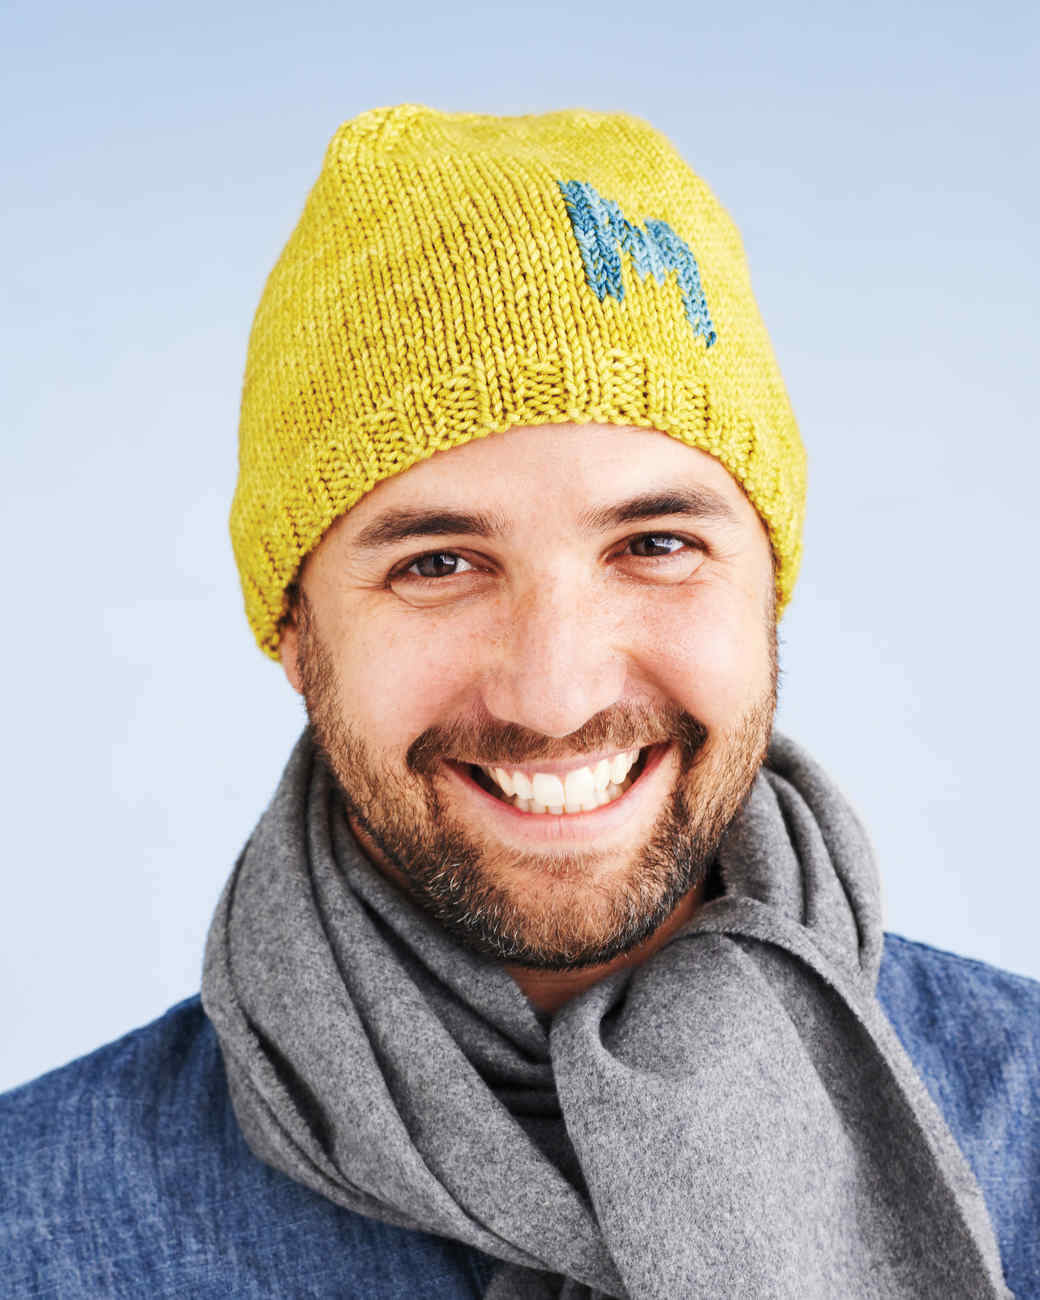 kyle-man-hat-scarf-351-d111452.jpg